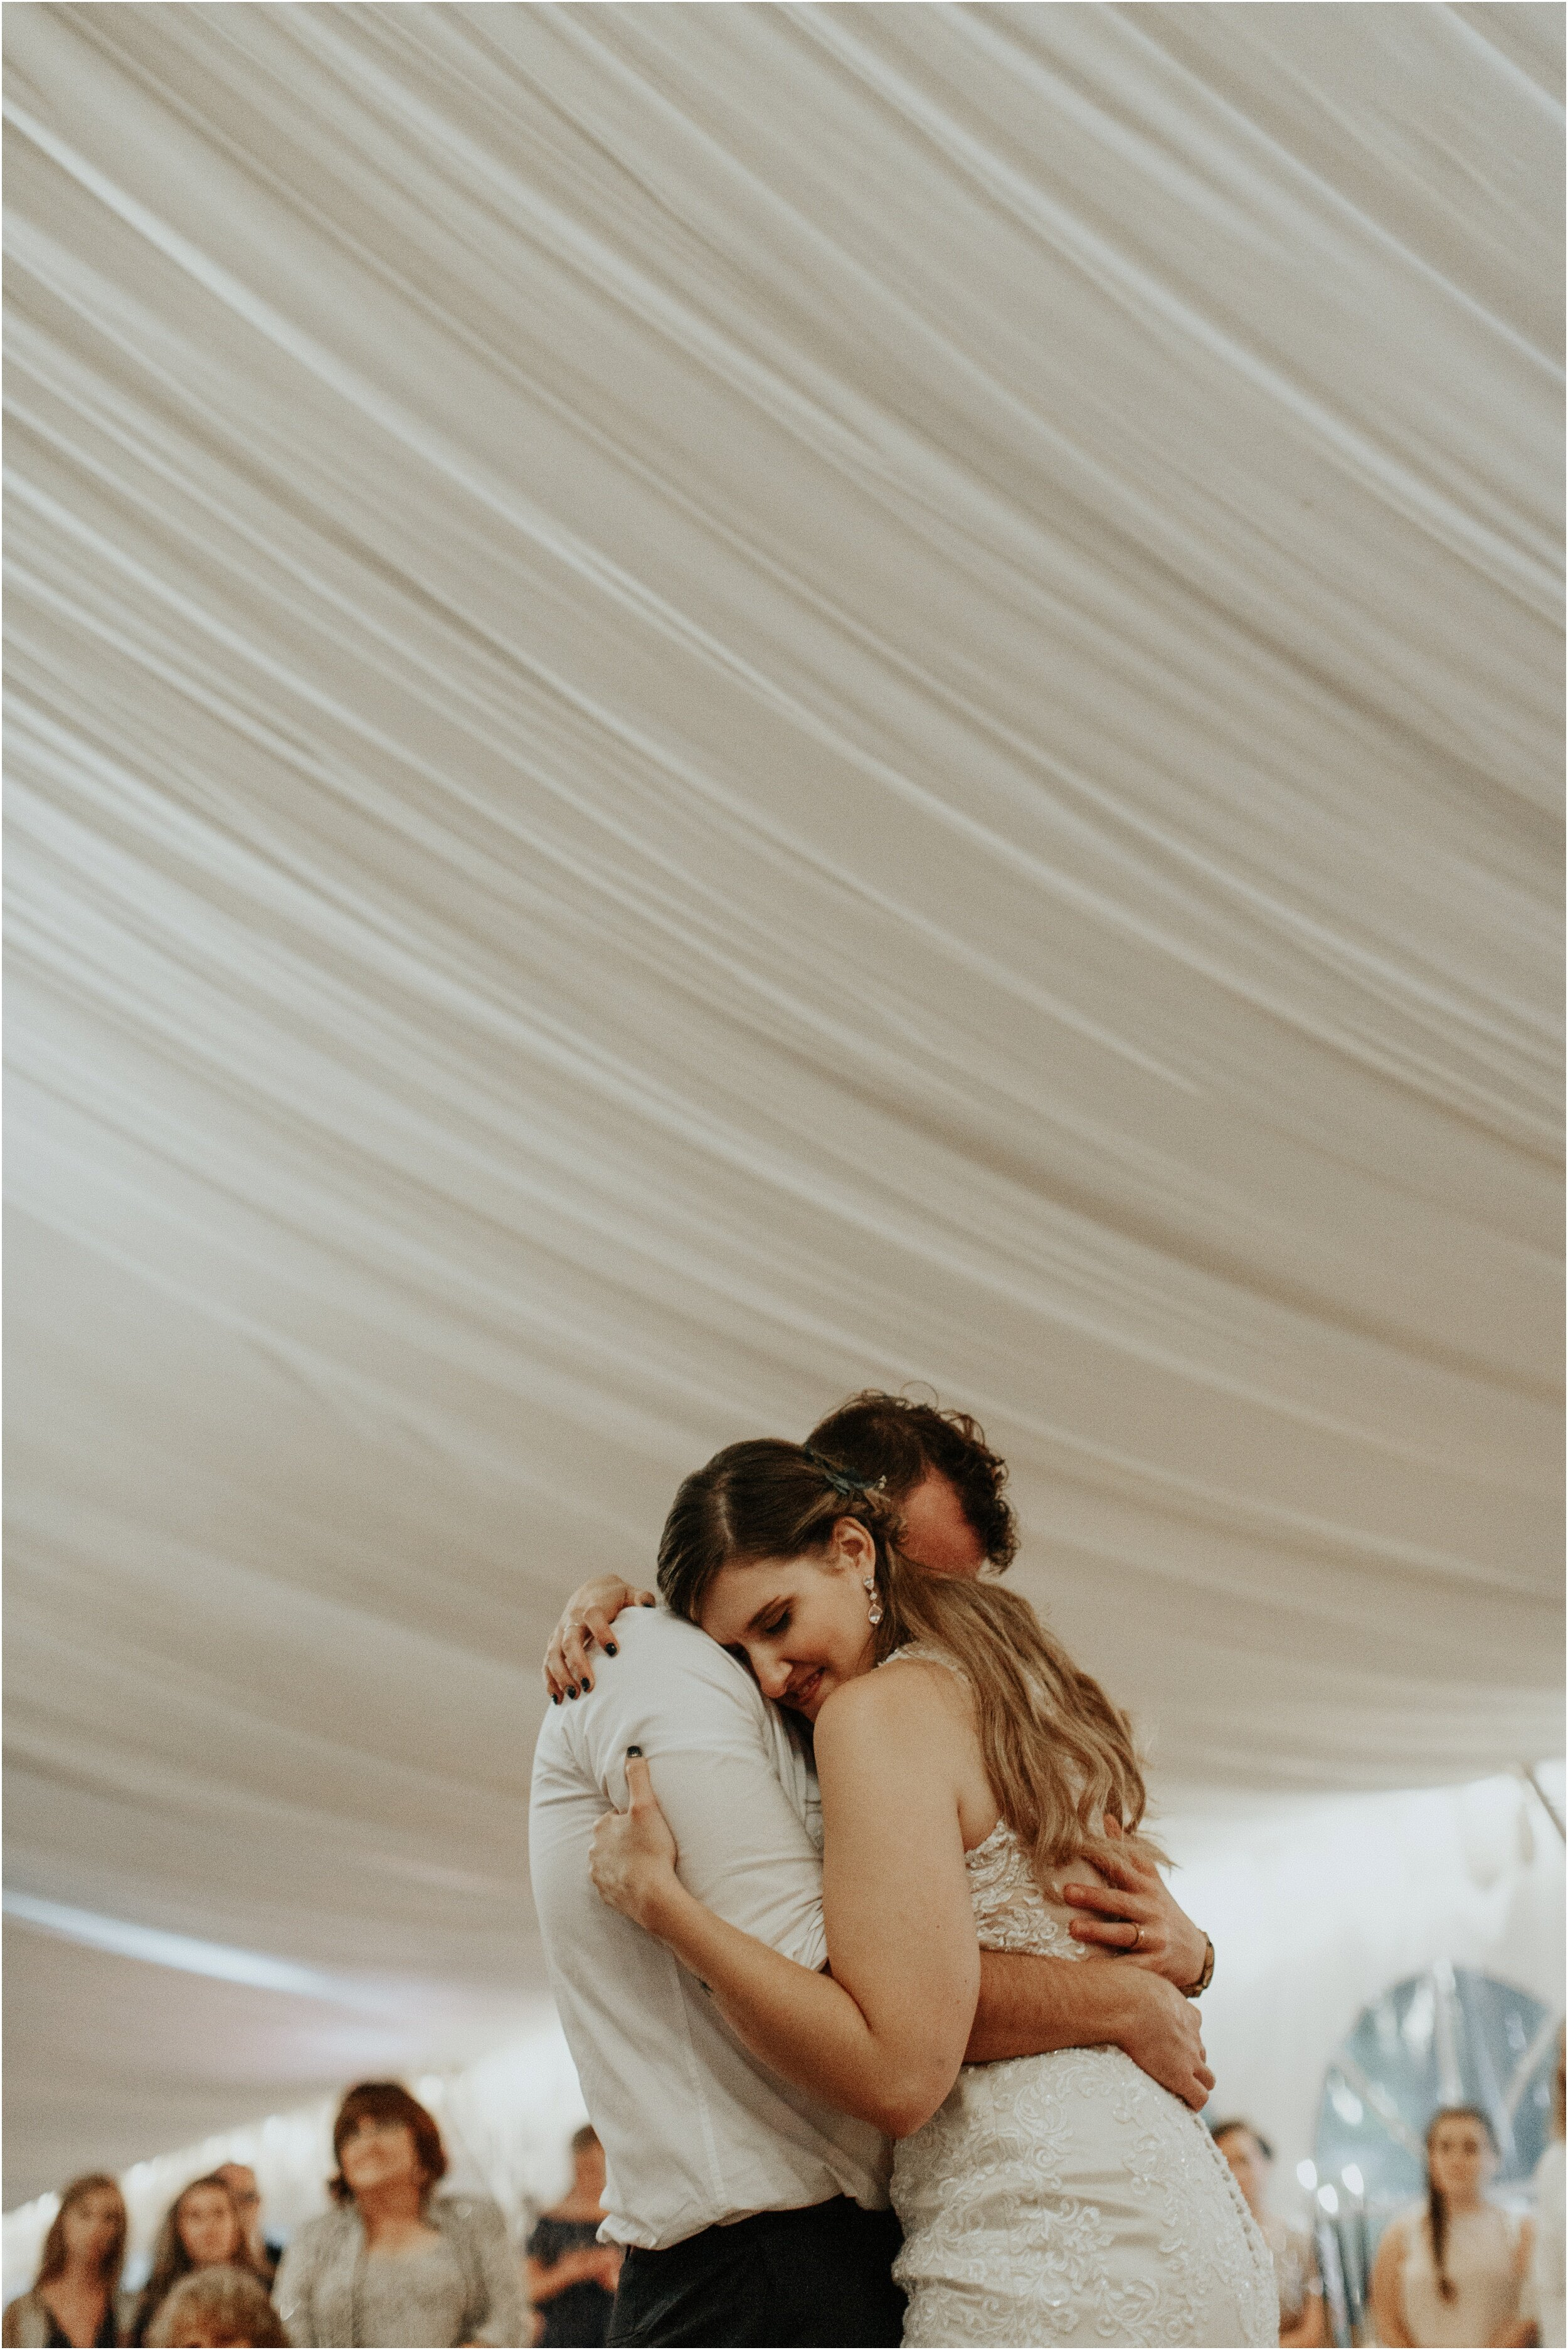 steph-and-jordan-cox-our-wedding-historic-shady-lane-compass-wedding-collective-hazel-lining-photography-destination-elopement-wedding-engagement-photography_0089.jpg